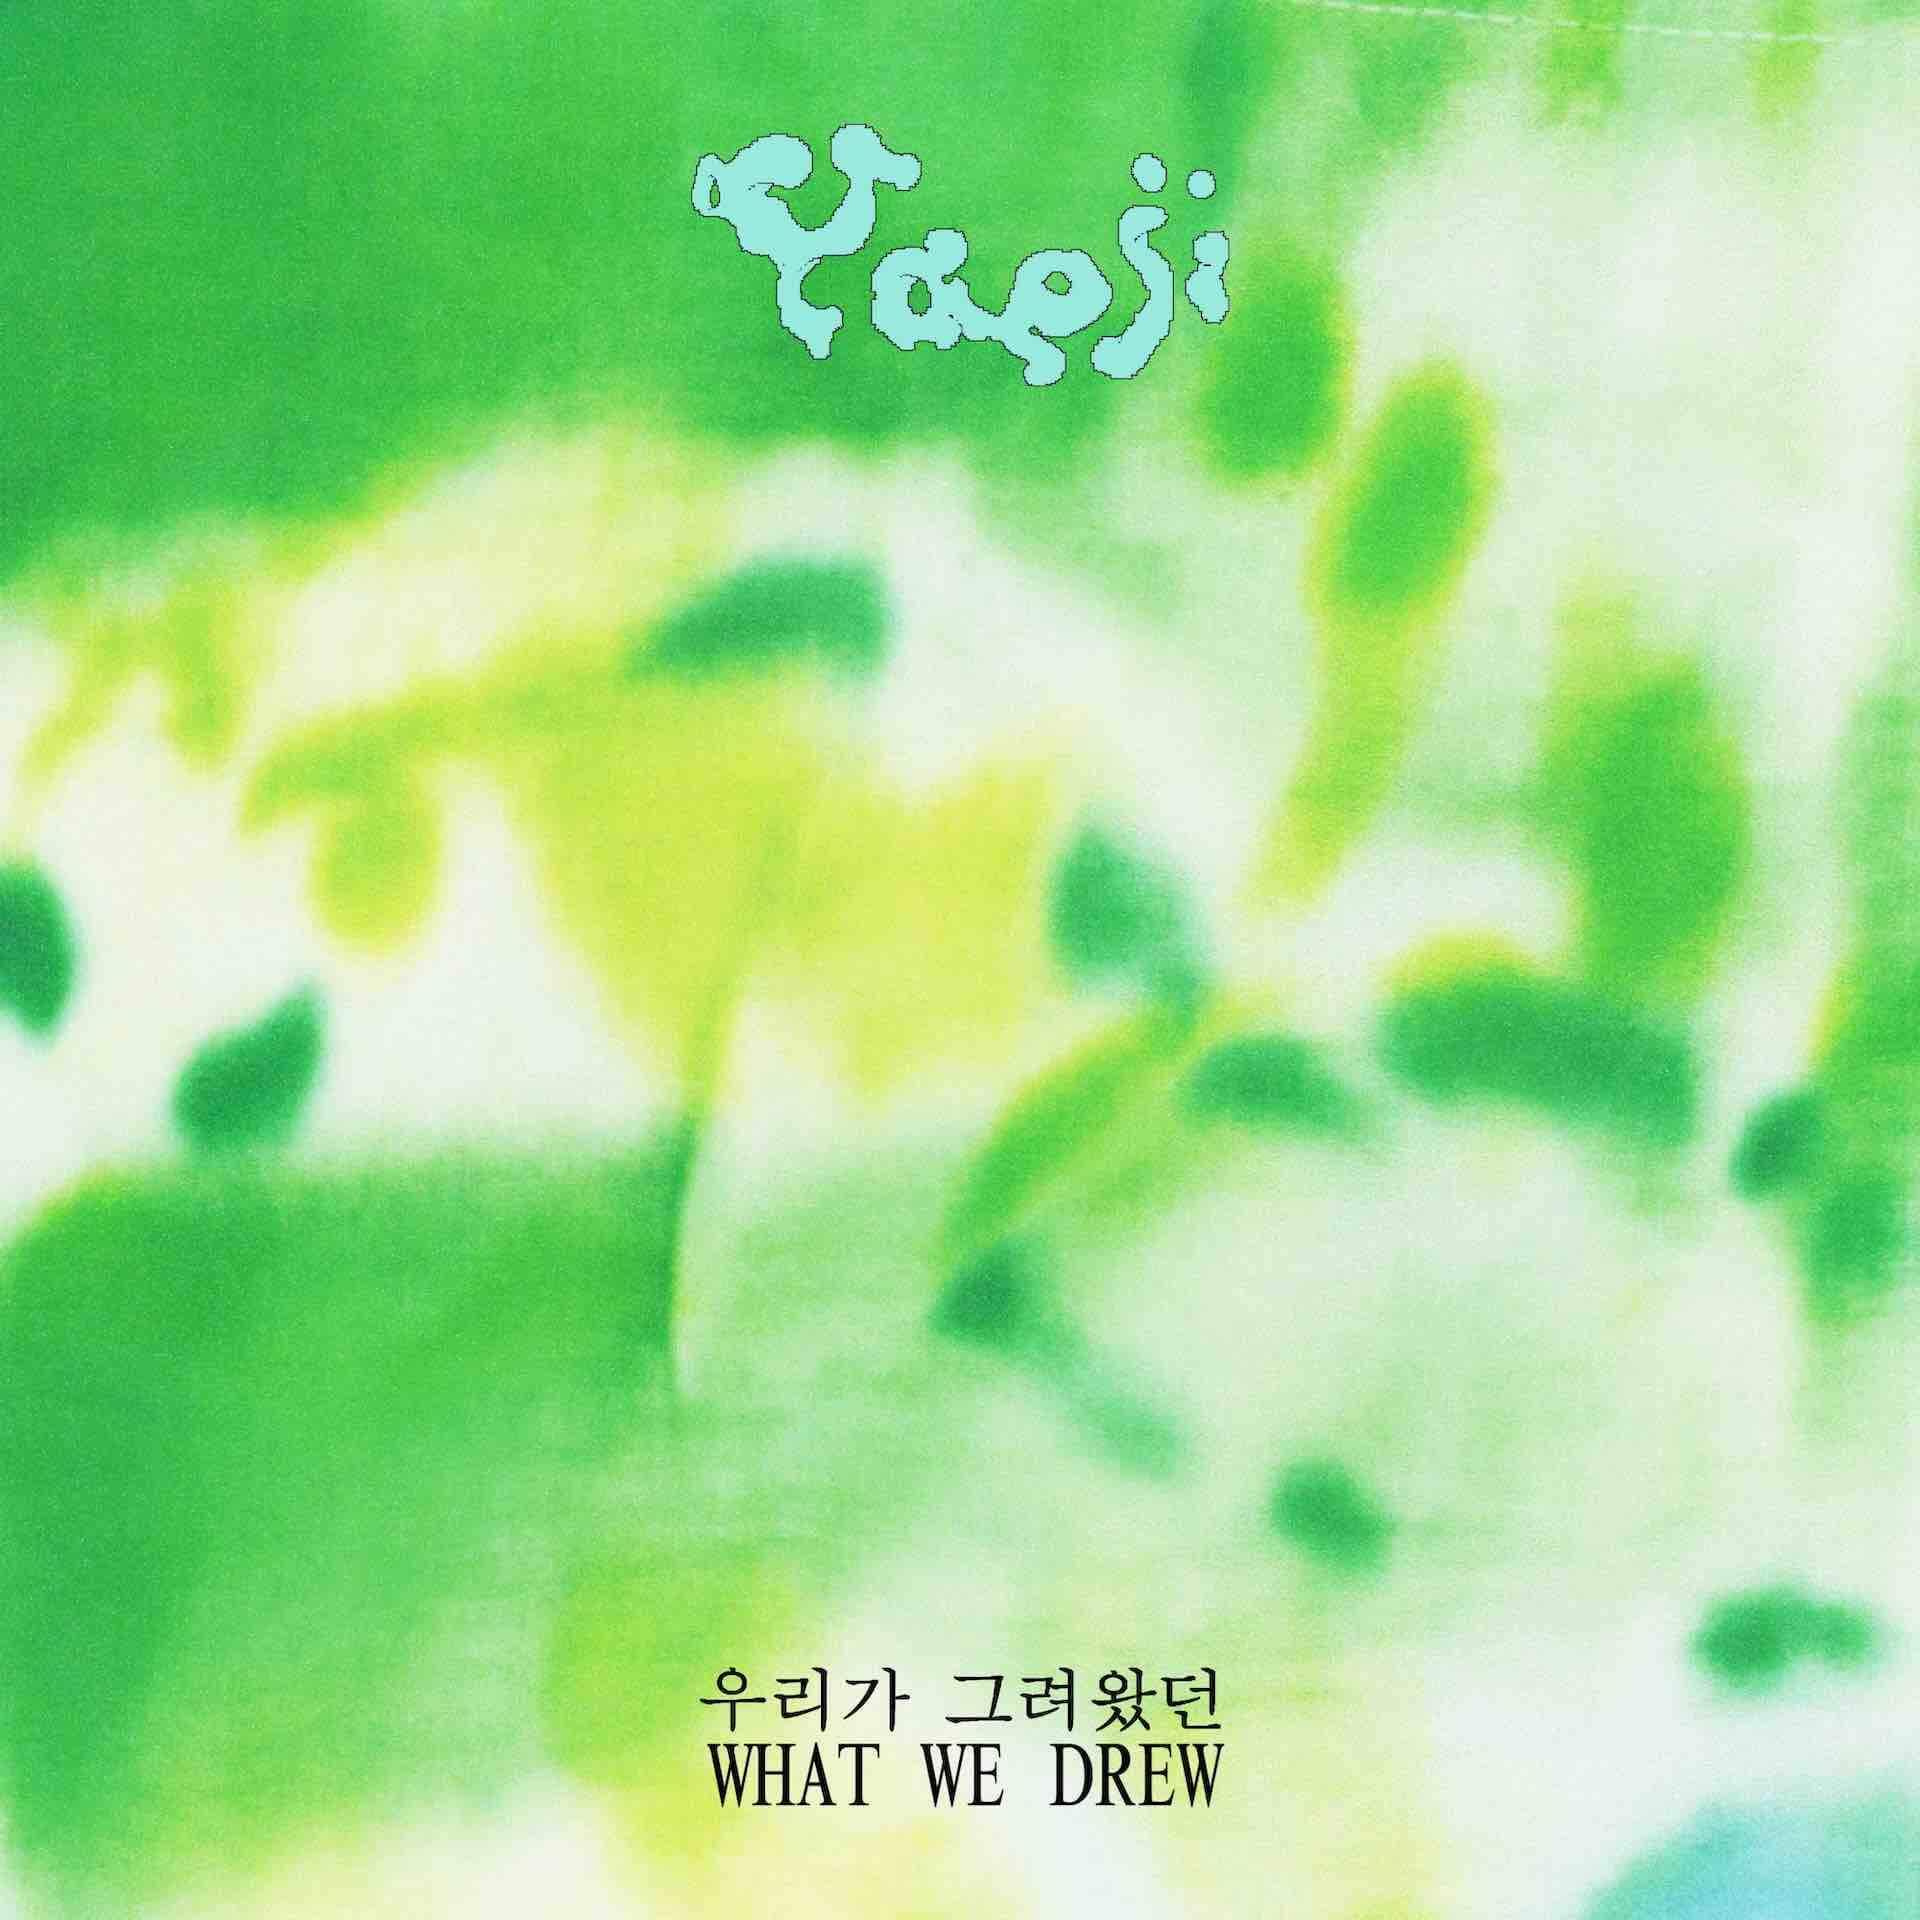 "Yaejiが〈XR Recordings〉から最新ミックステープをリリース!""WAKING UP DOWN""のアニメーションMVも公開 music200311_yaejimixtape_03"